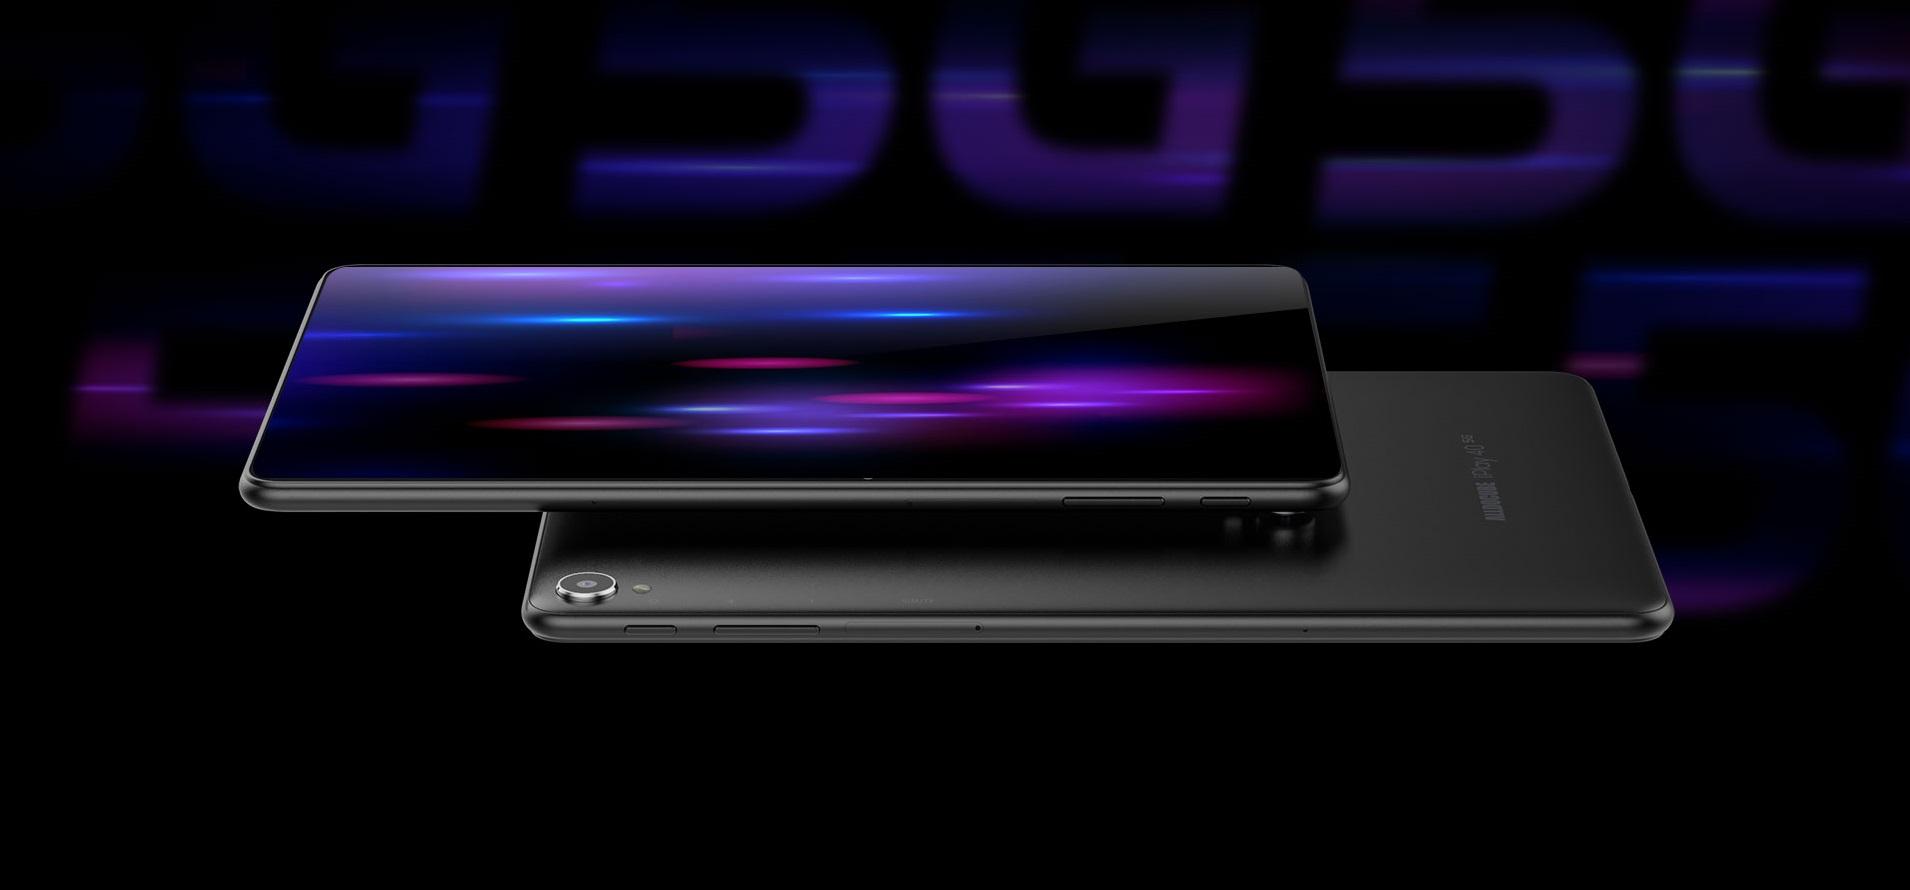 Alldocube iPlay 40 5G tablet